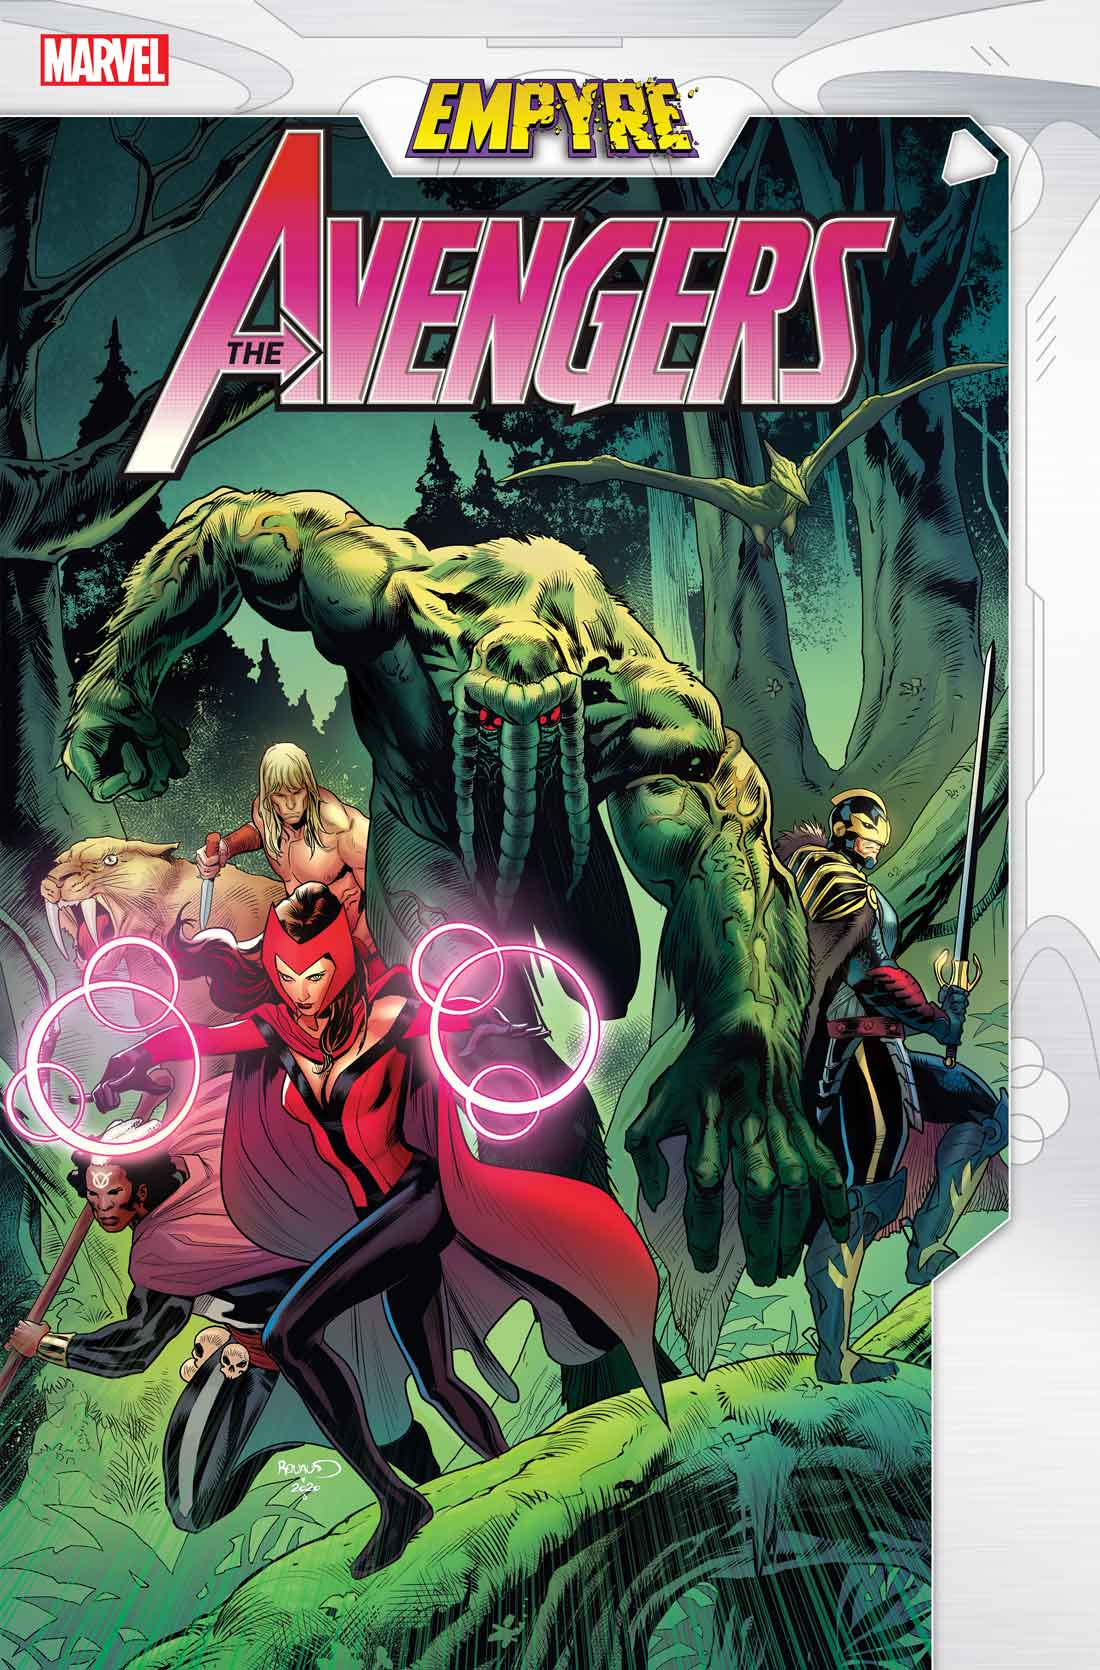 HEROES /& FANTASIES UNSORTED MYSTERY COMIC BOX 15 books+Bonus Exclusive* Variant